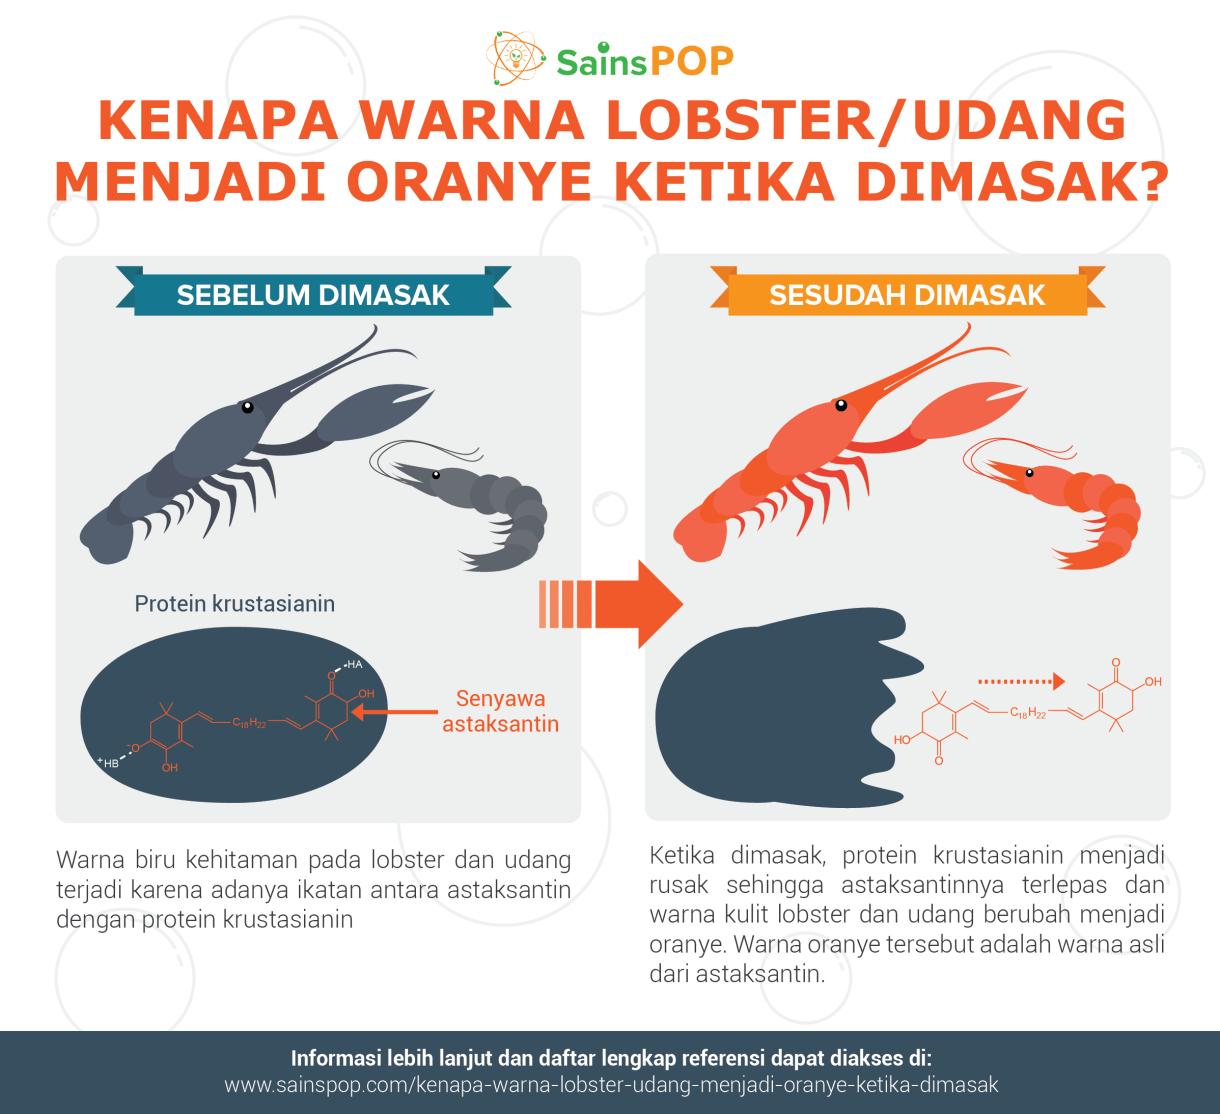 Kenapa Warna Lobster/Udang Menjadi Oranye Ketika Dimasak